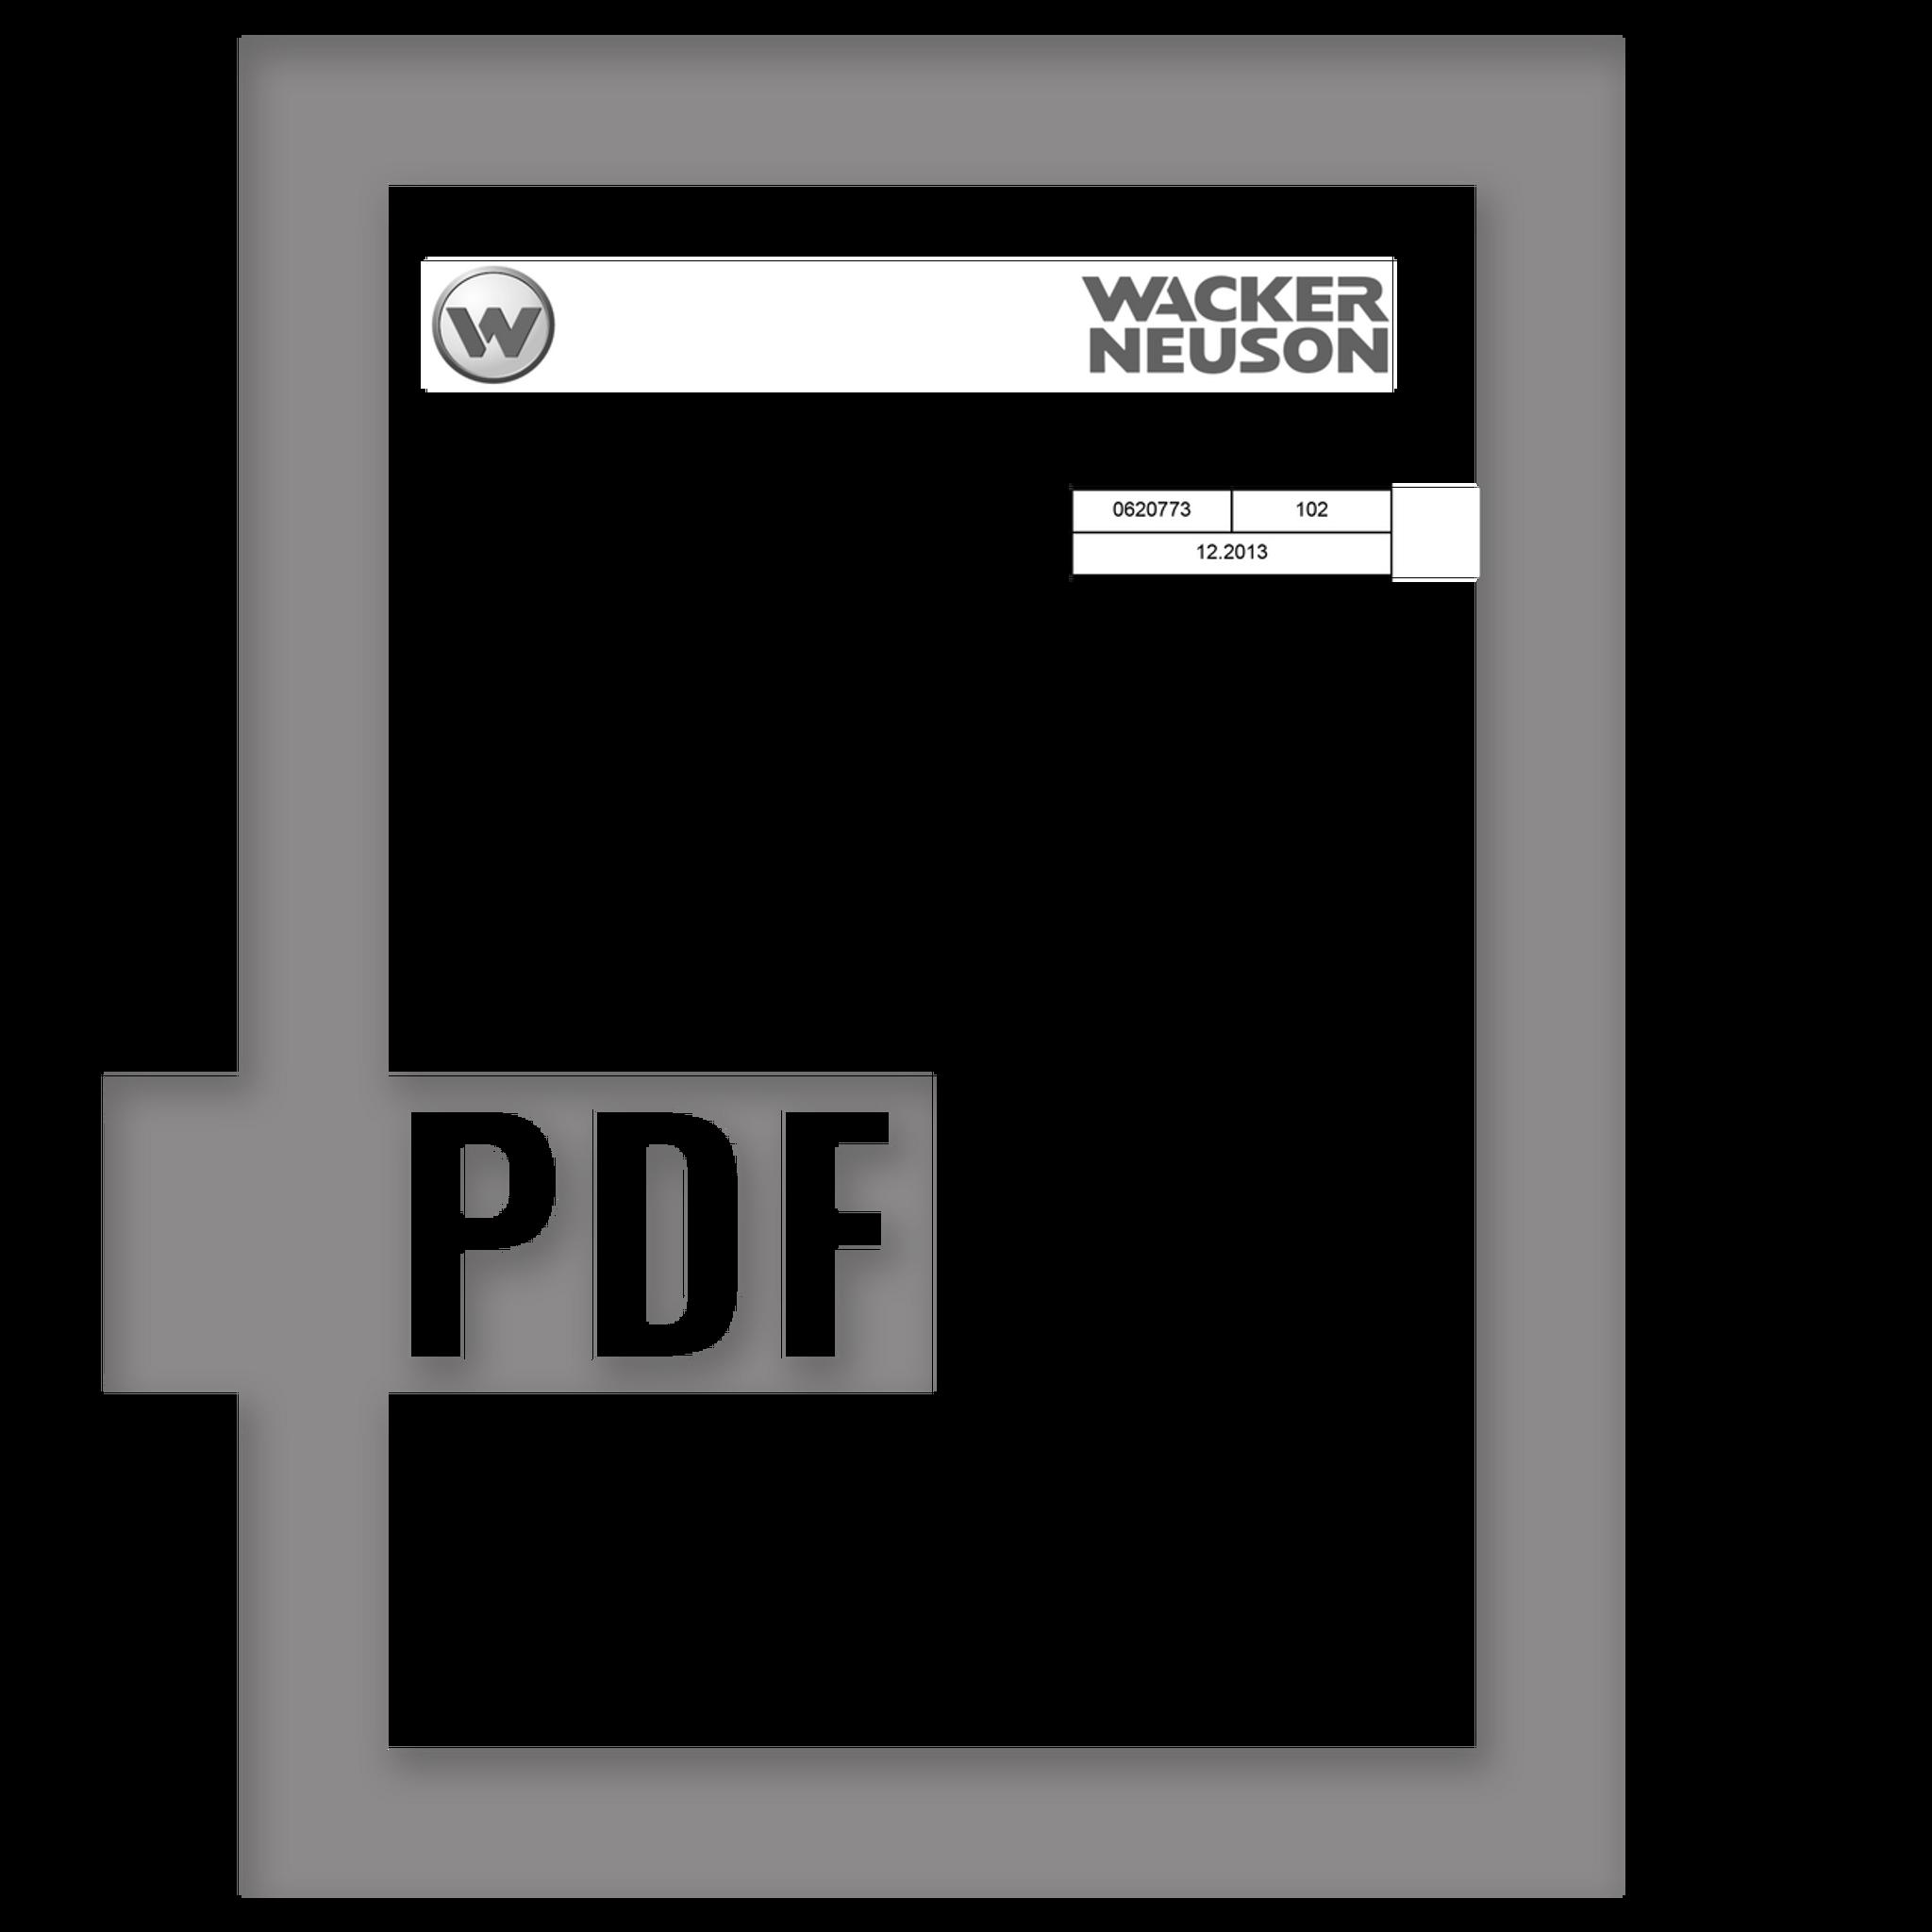 parts manual pdt3a item 0620773 rev 102 free download dhs rh stores dhsequipmentparts com wacker neuson rd12a parts manual Wacker Neuson Parts Diagram 6055